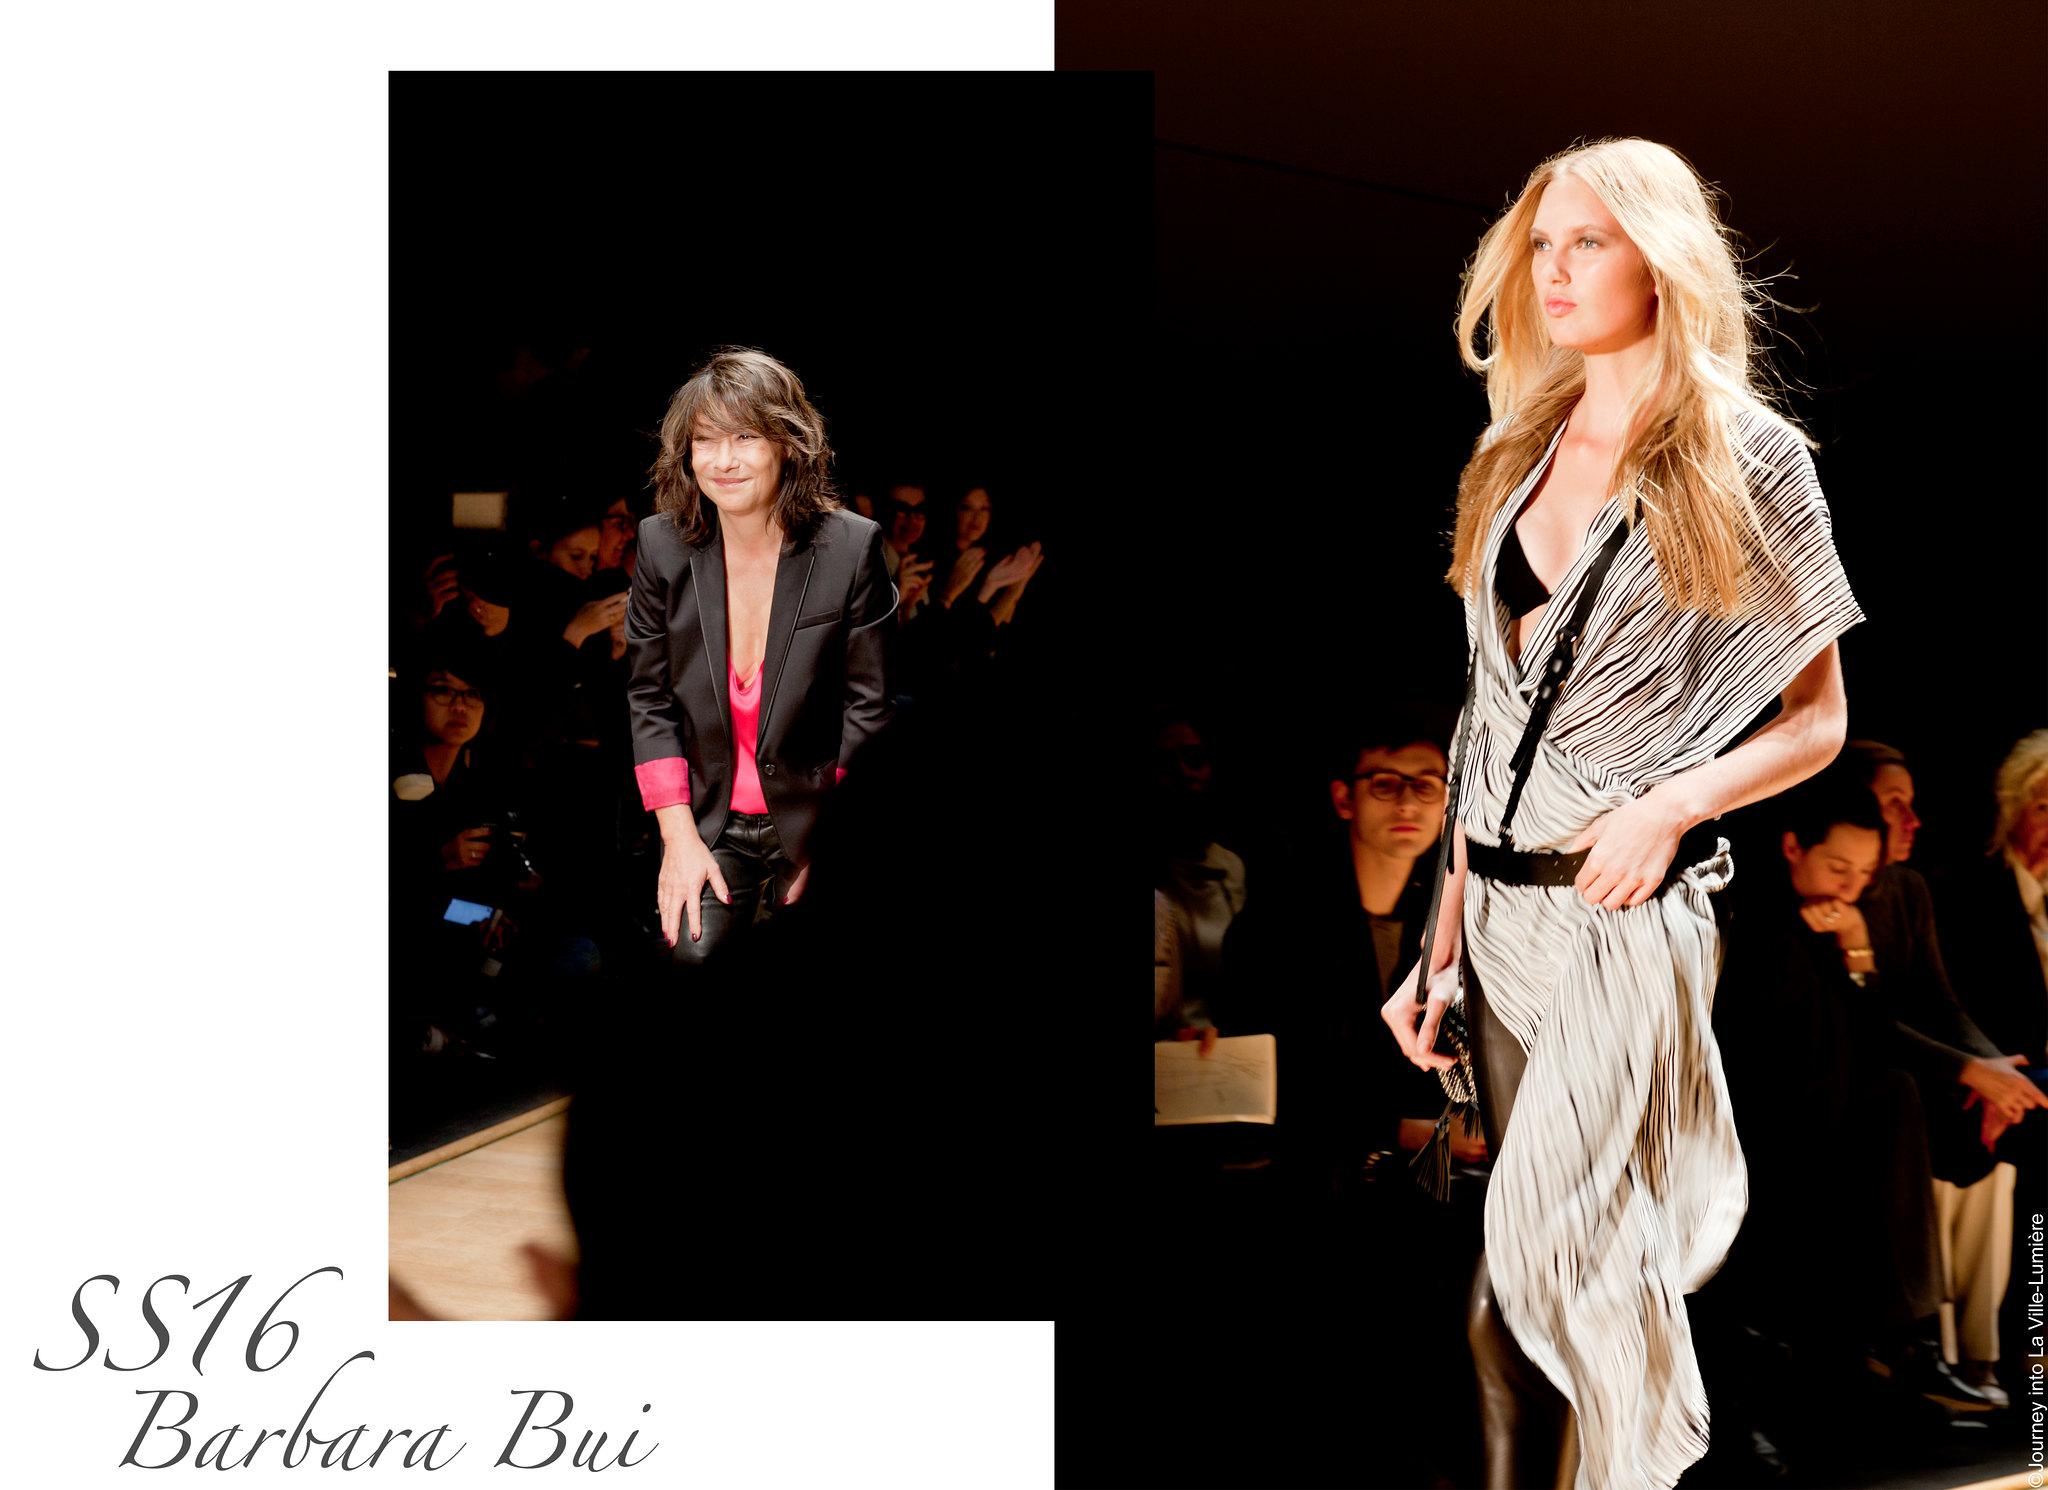 Barbara Bui, Runaway